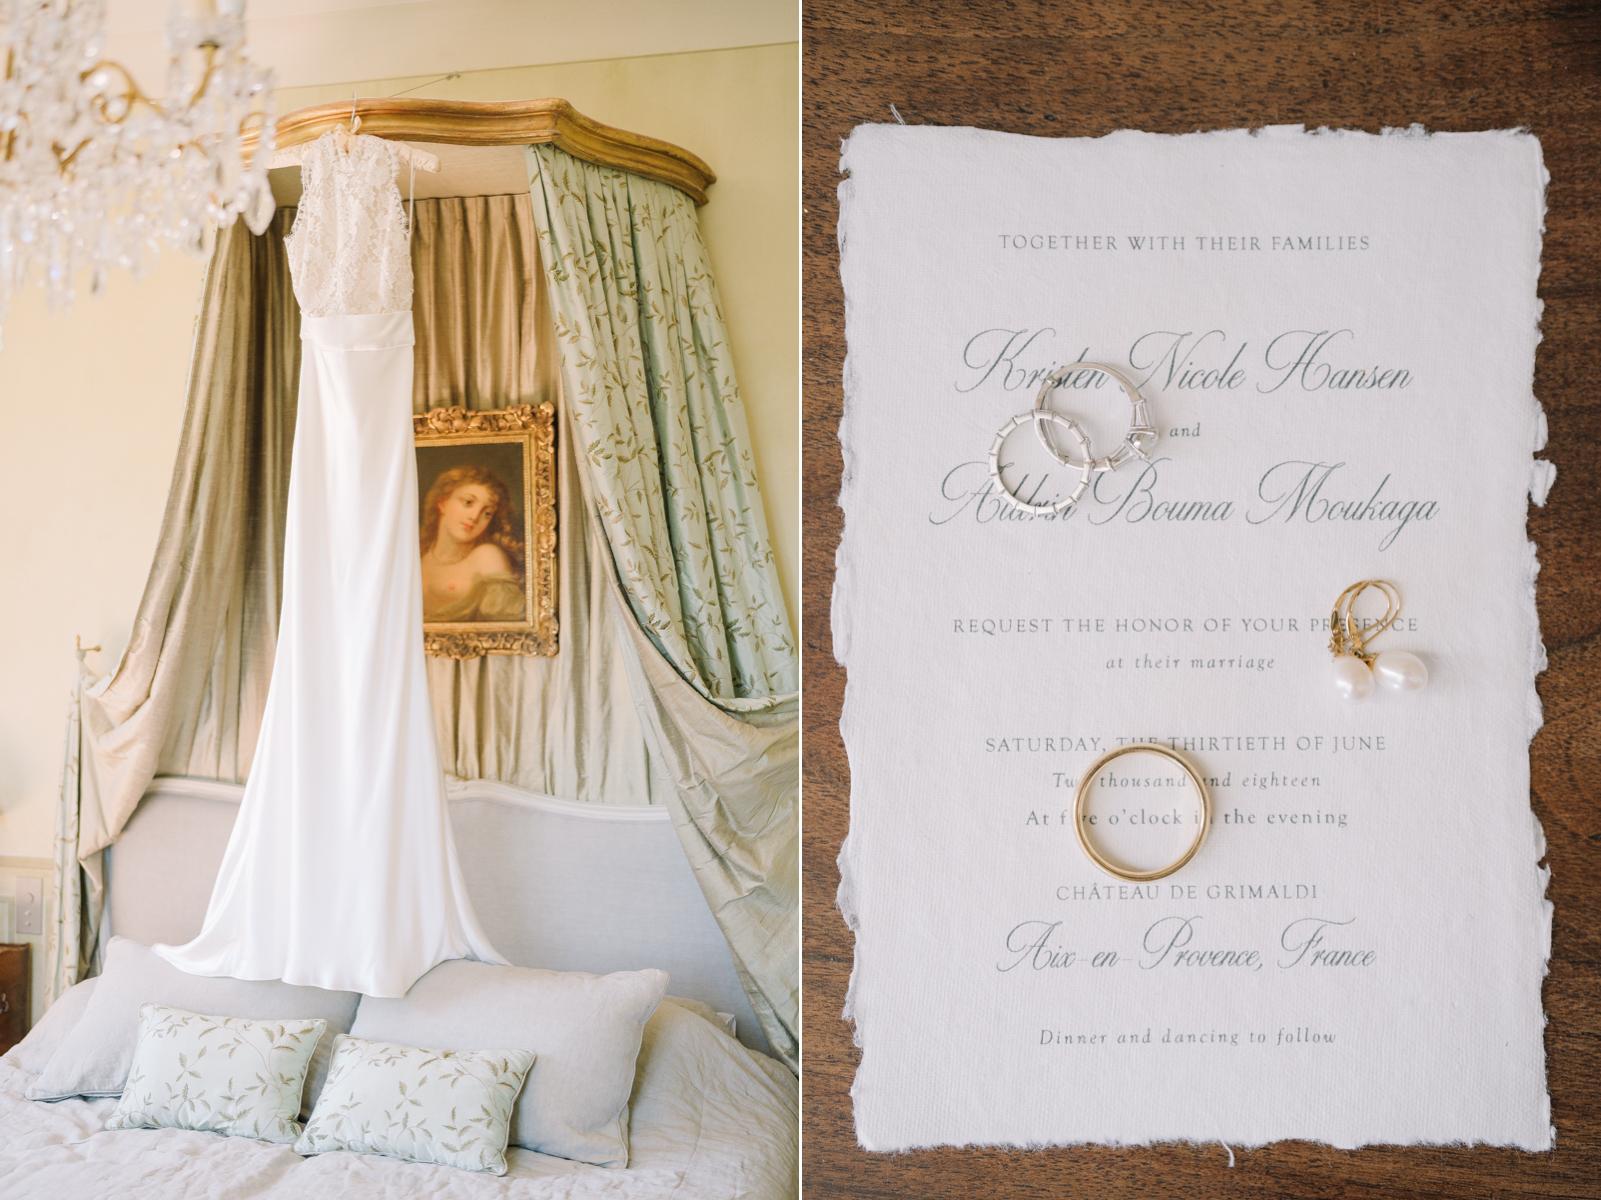 Boheme-Moon-Photography-Wedding-in-Provence-France_002.jpg